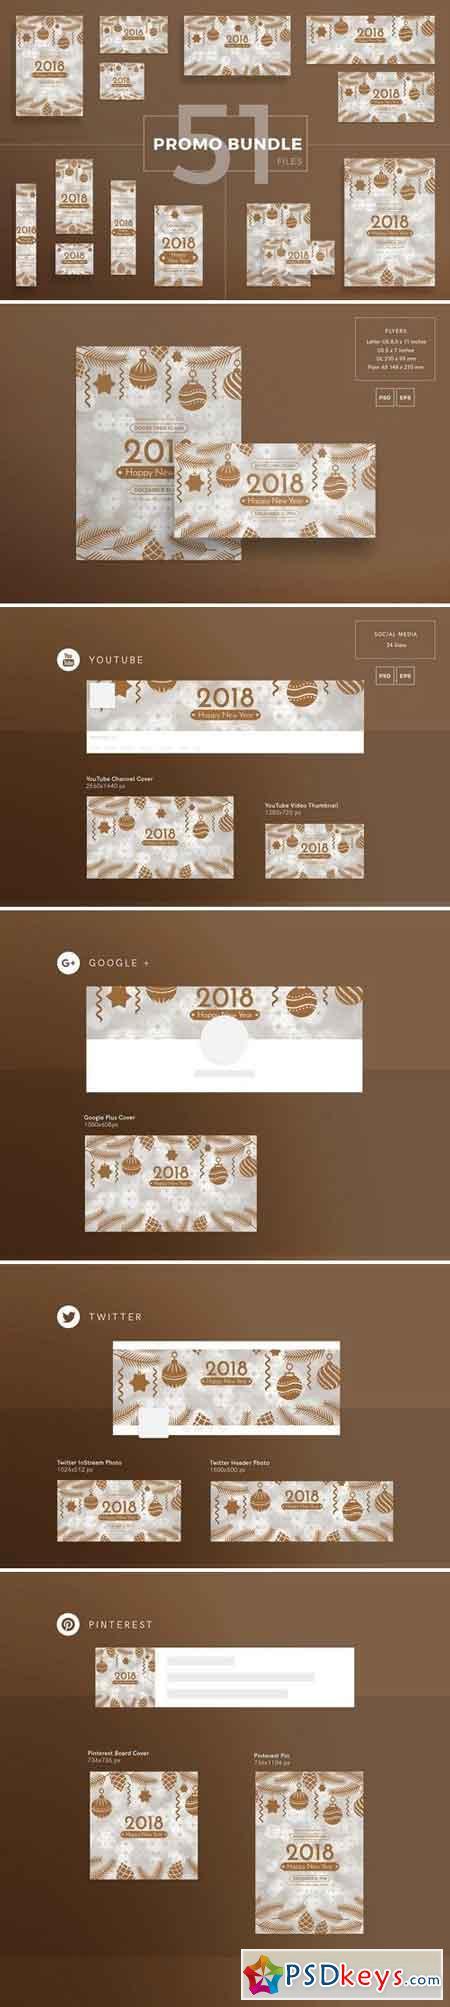 Promo Bundle Happy New Year 2105106